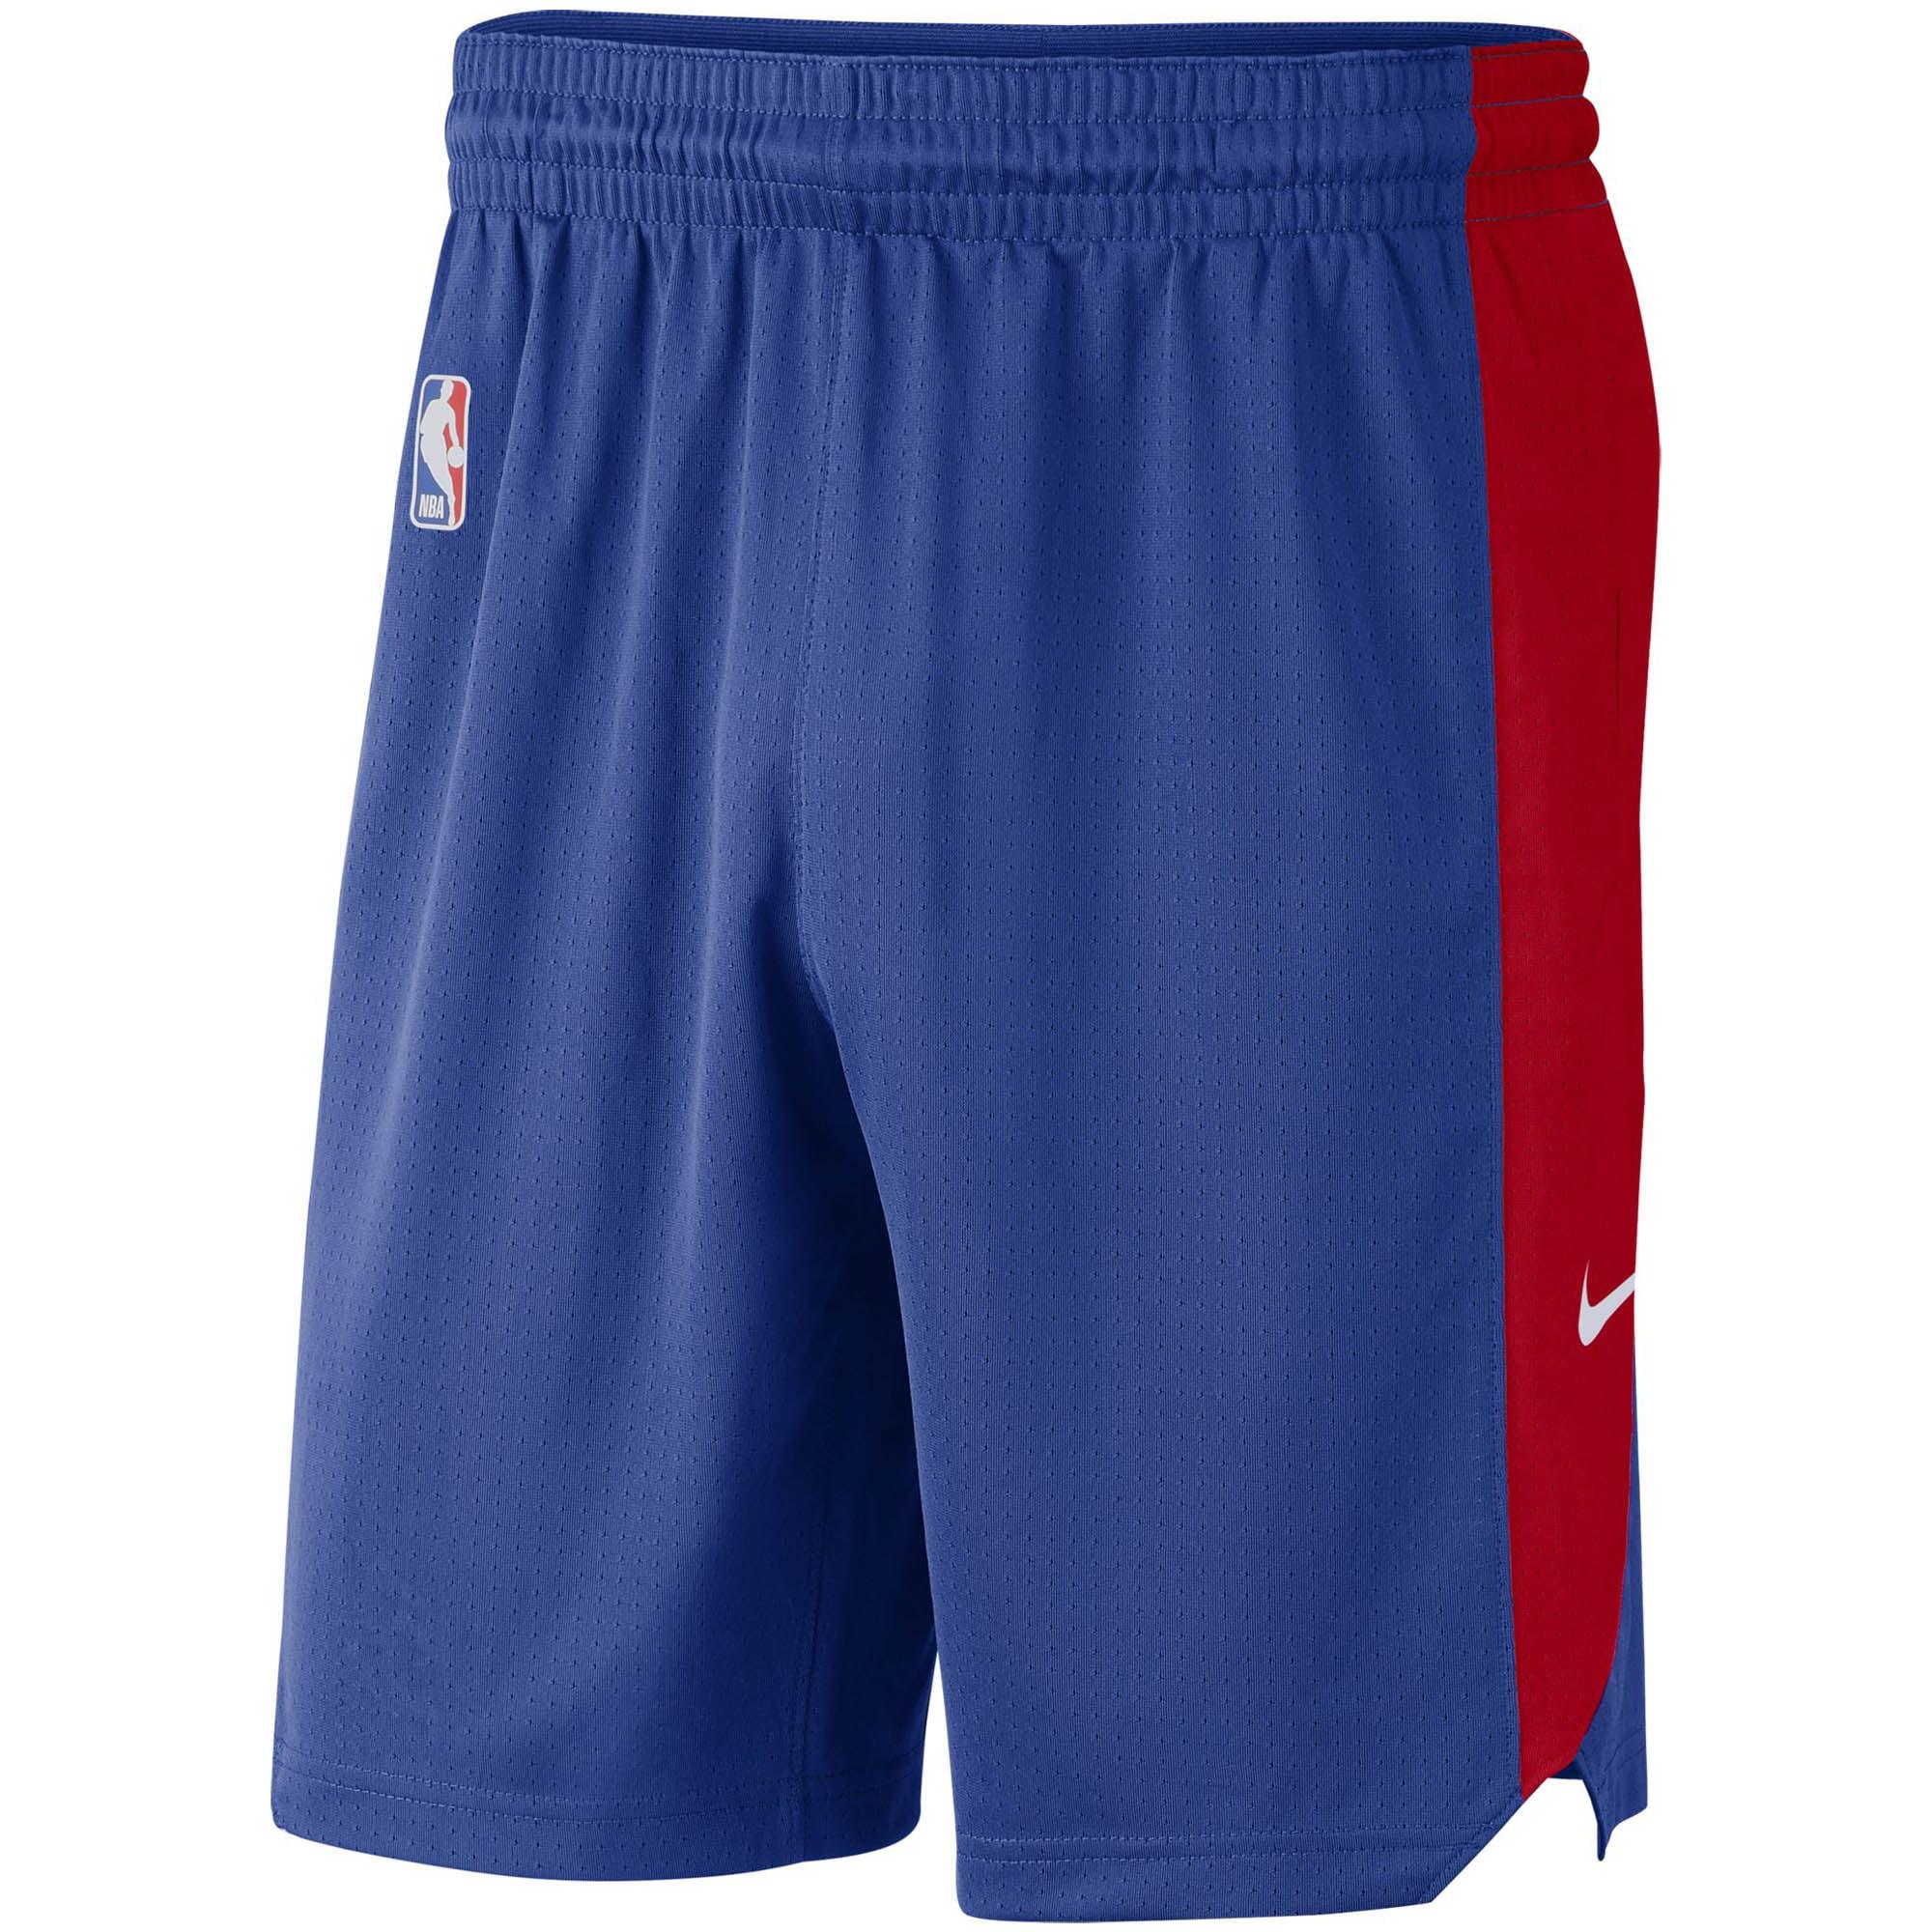 Philadelphia 76ers Nike Performance Practice Shorts - Royal